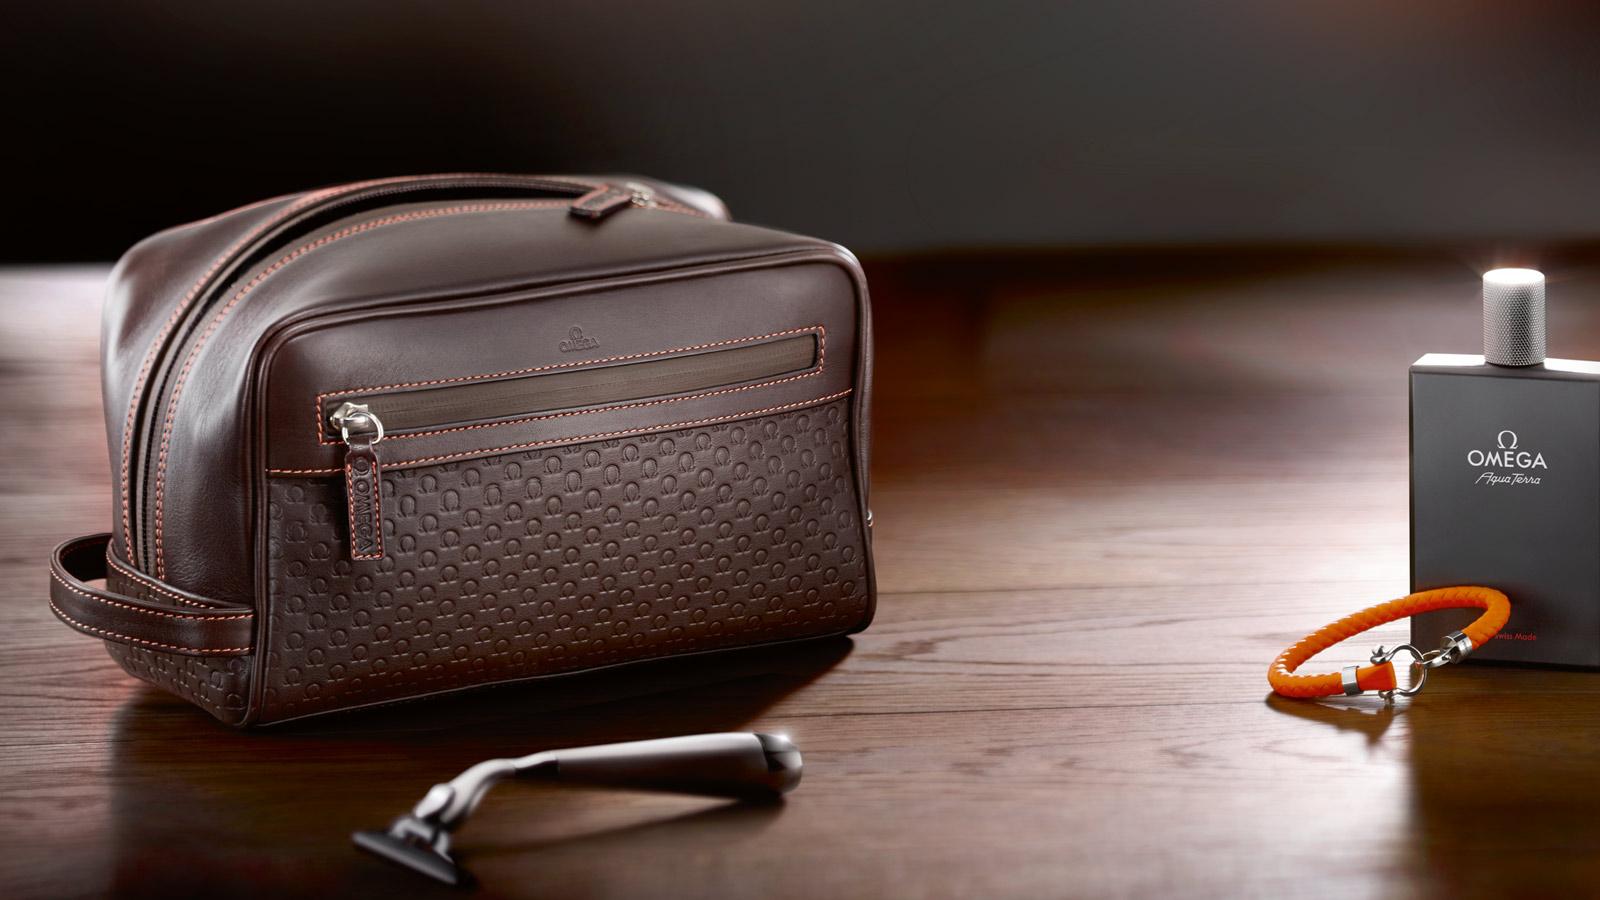 Omega dopp kit, Omega accessories, Omega fine leather goods